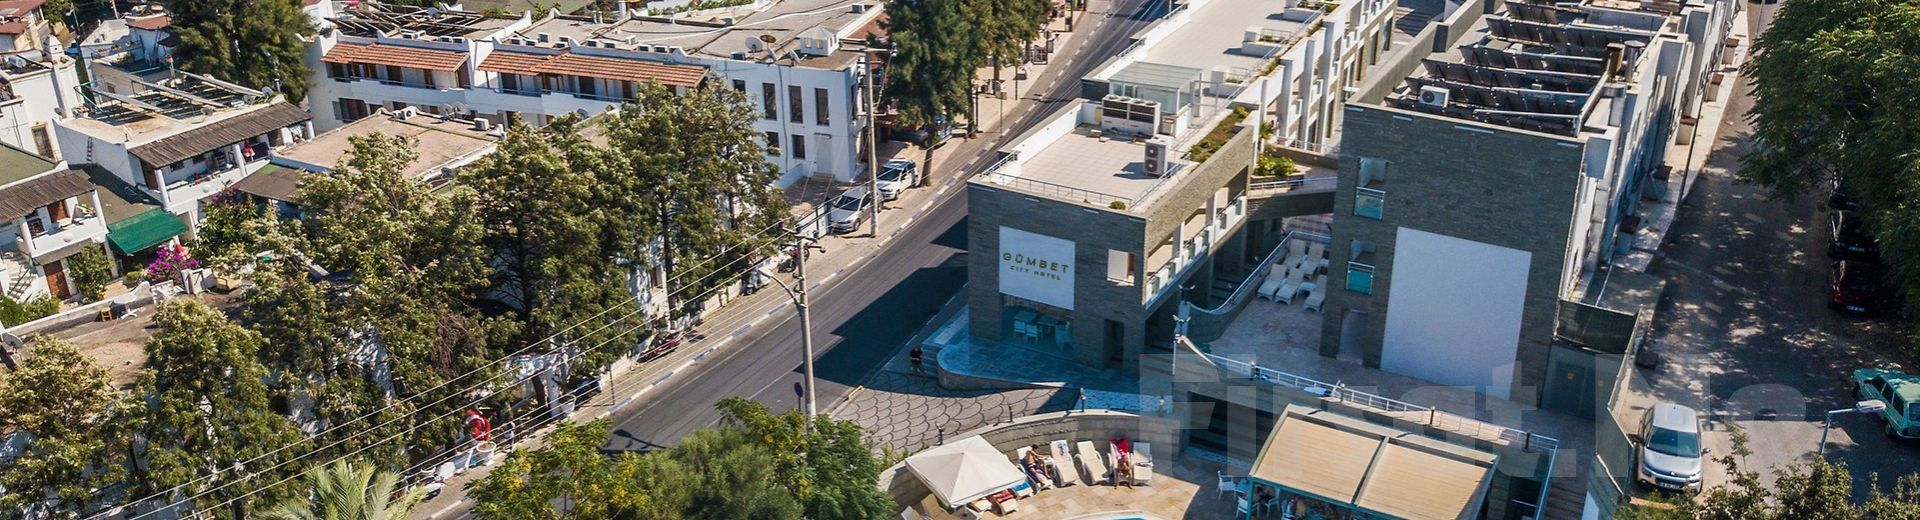 Gümbet City Hotel Bodrum'da Her Şey Dahil Konaklama